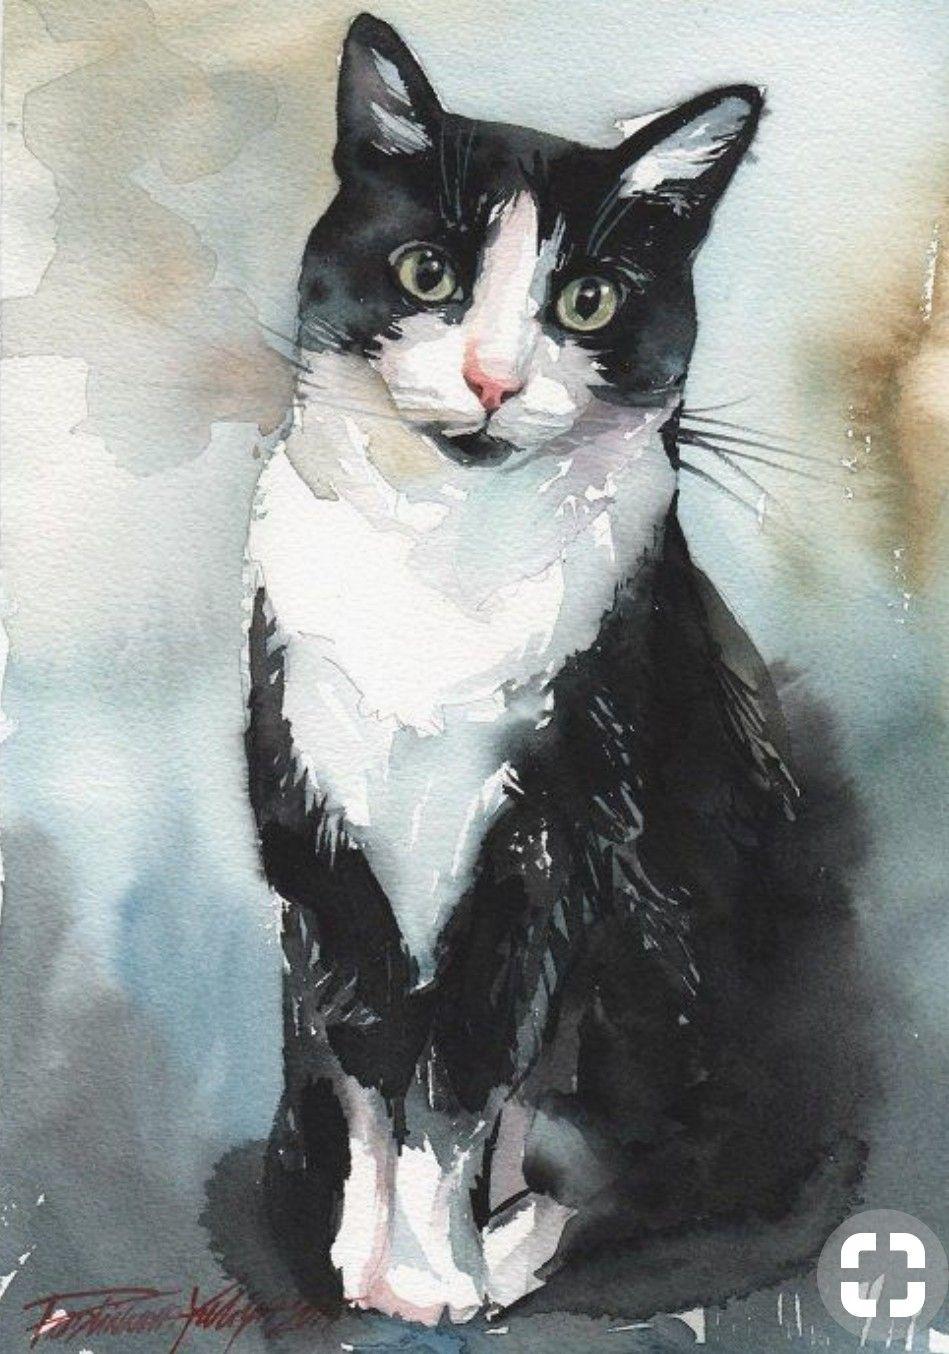 eab98ef31403 Tuxedo cat watercolor | Art: Cats | Watercolor cat, Cats, Watercolor ...